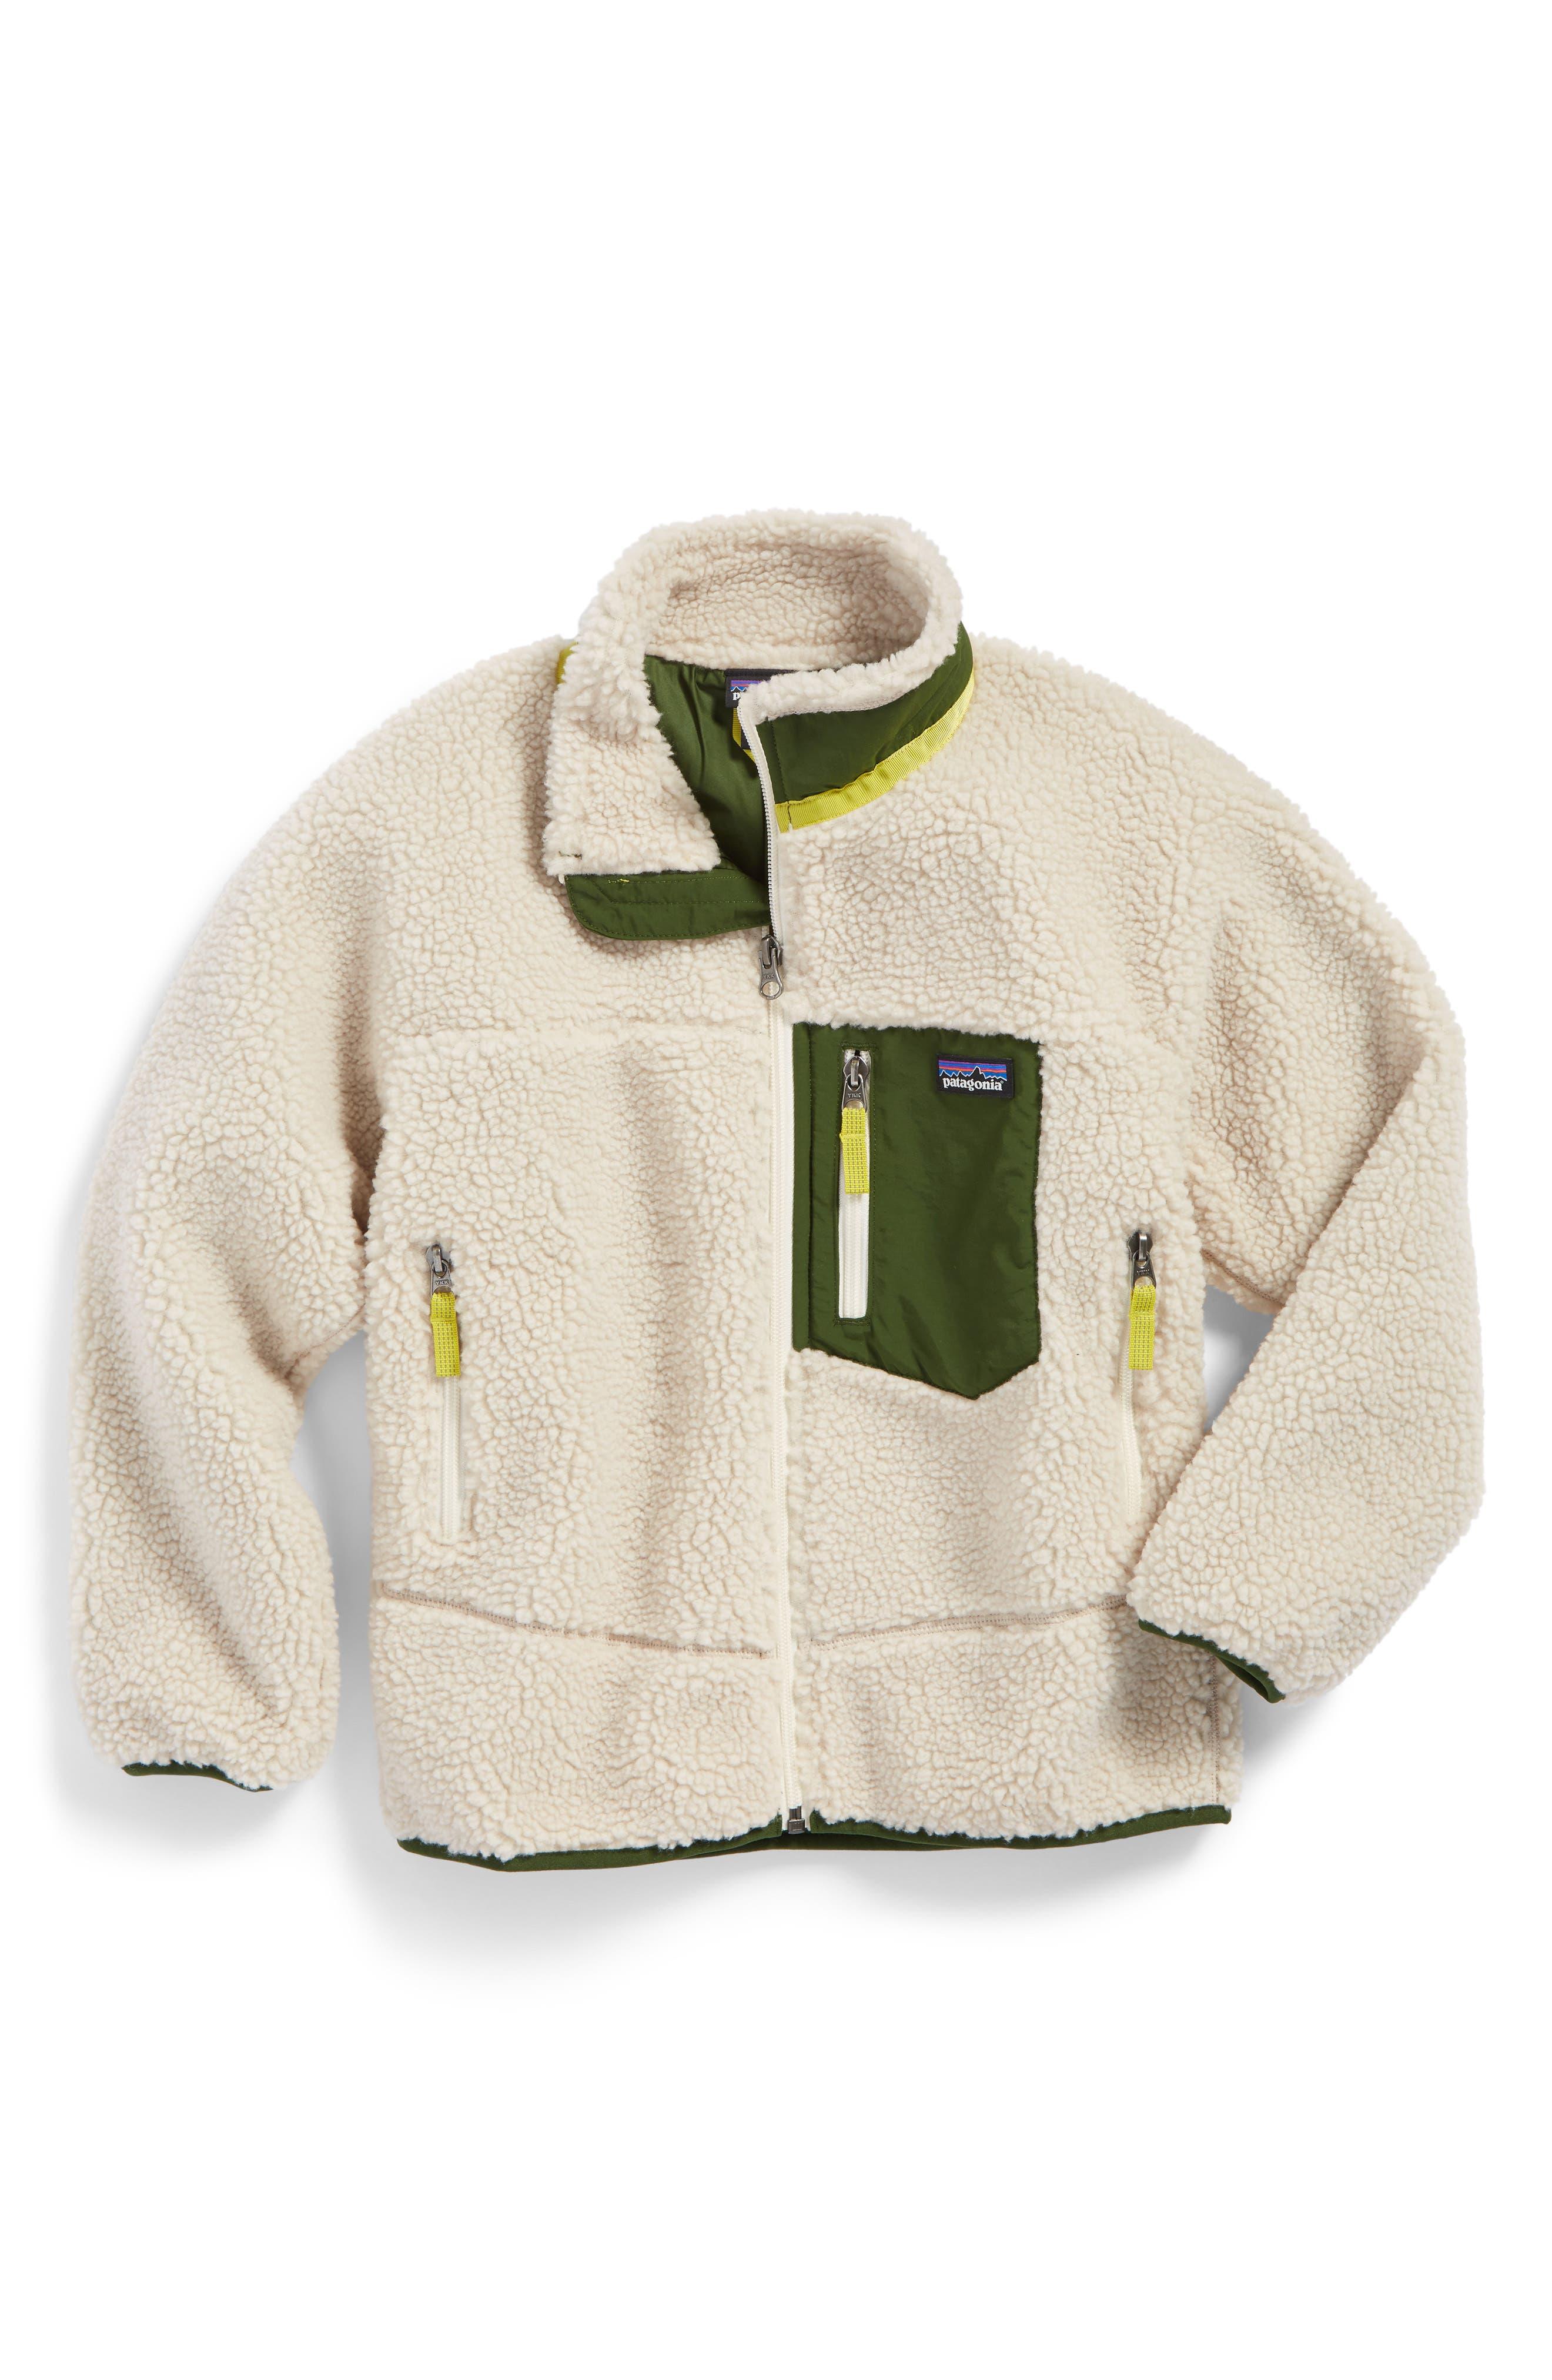 Retro-X Windproof Fleece Jacket,                             Main thumbnail 1, color,                             254